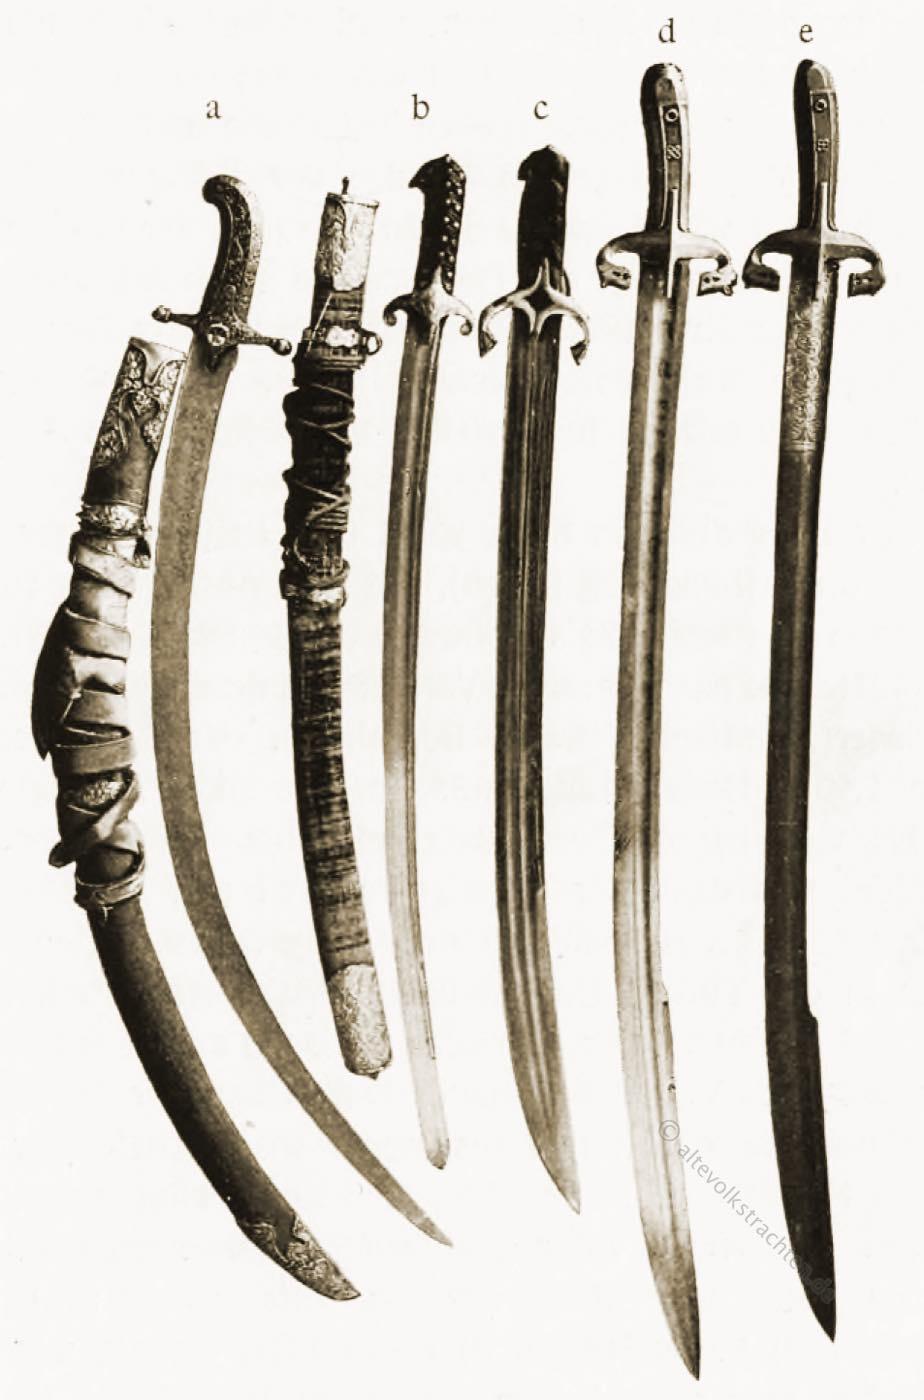 Karabelas, Hiebwaffen, Säbel, Polnische Säbel, Waffen, Waffenschmiede, Barock,